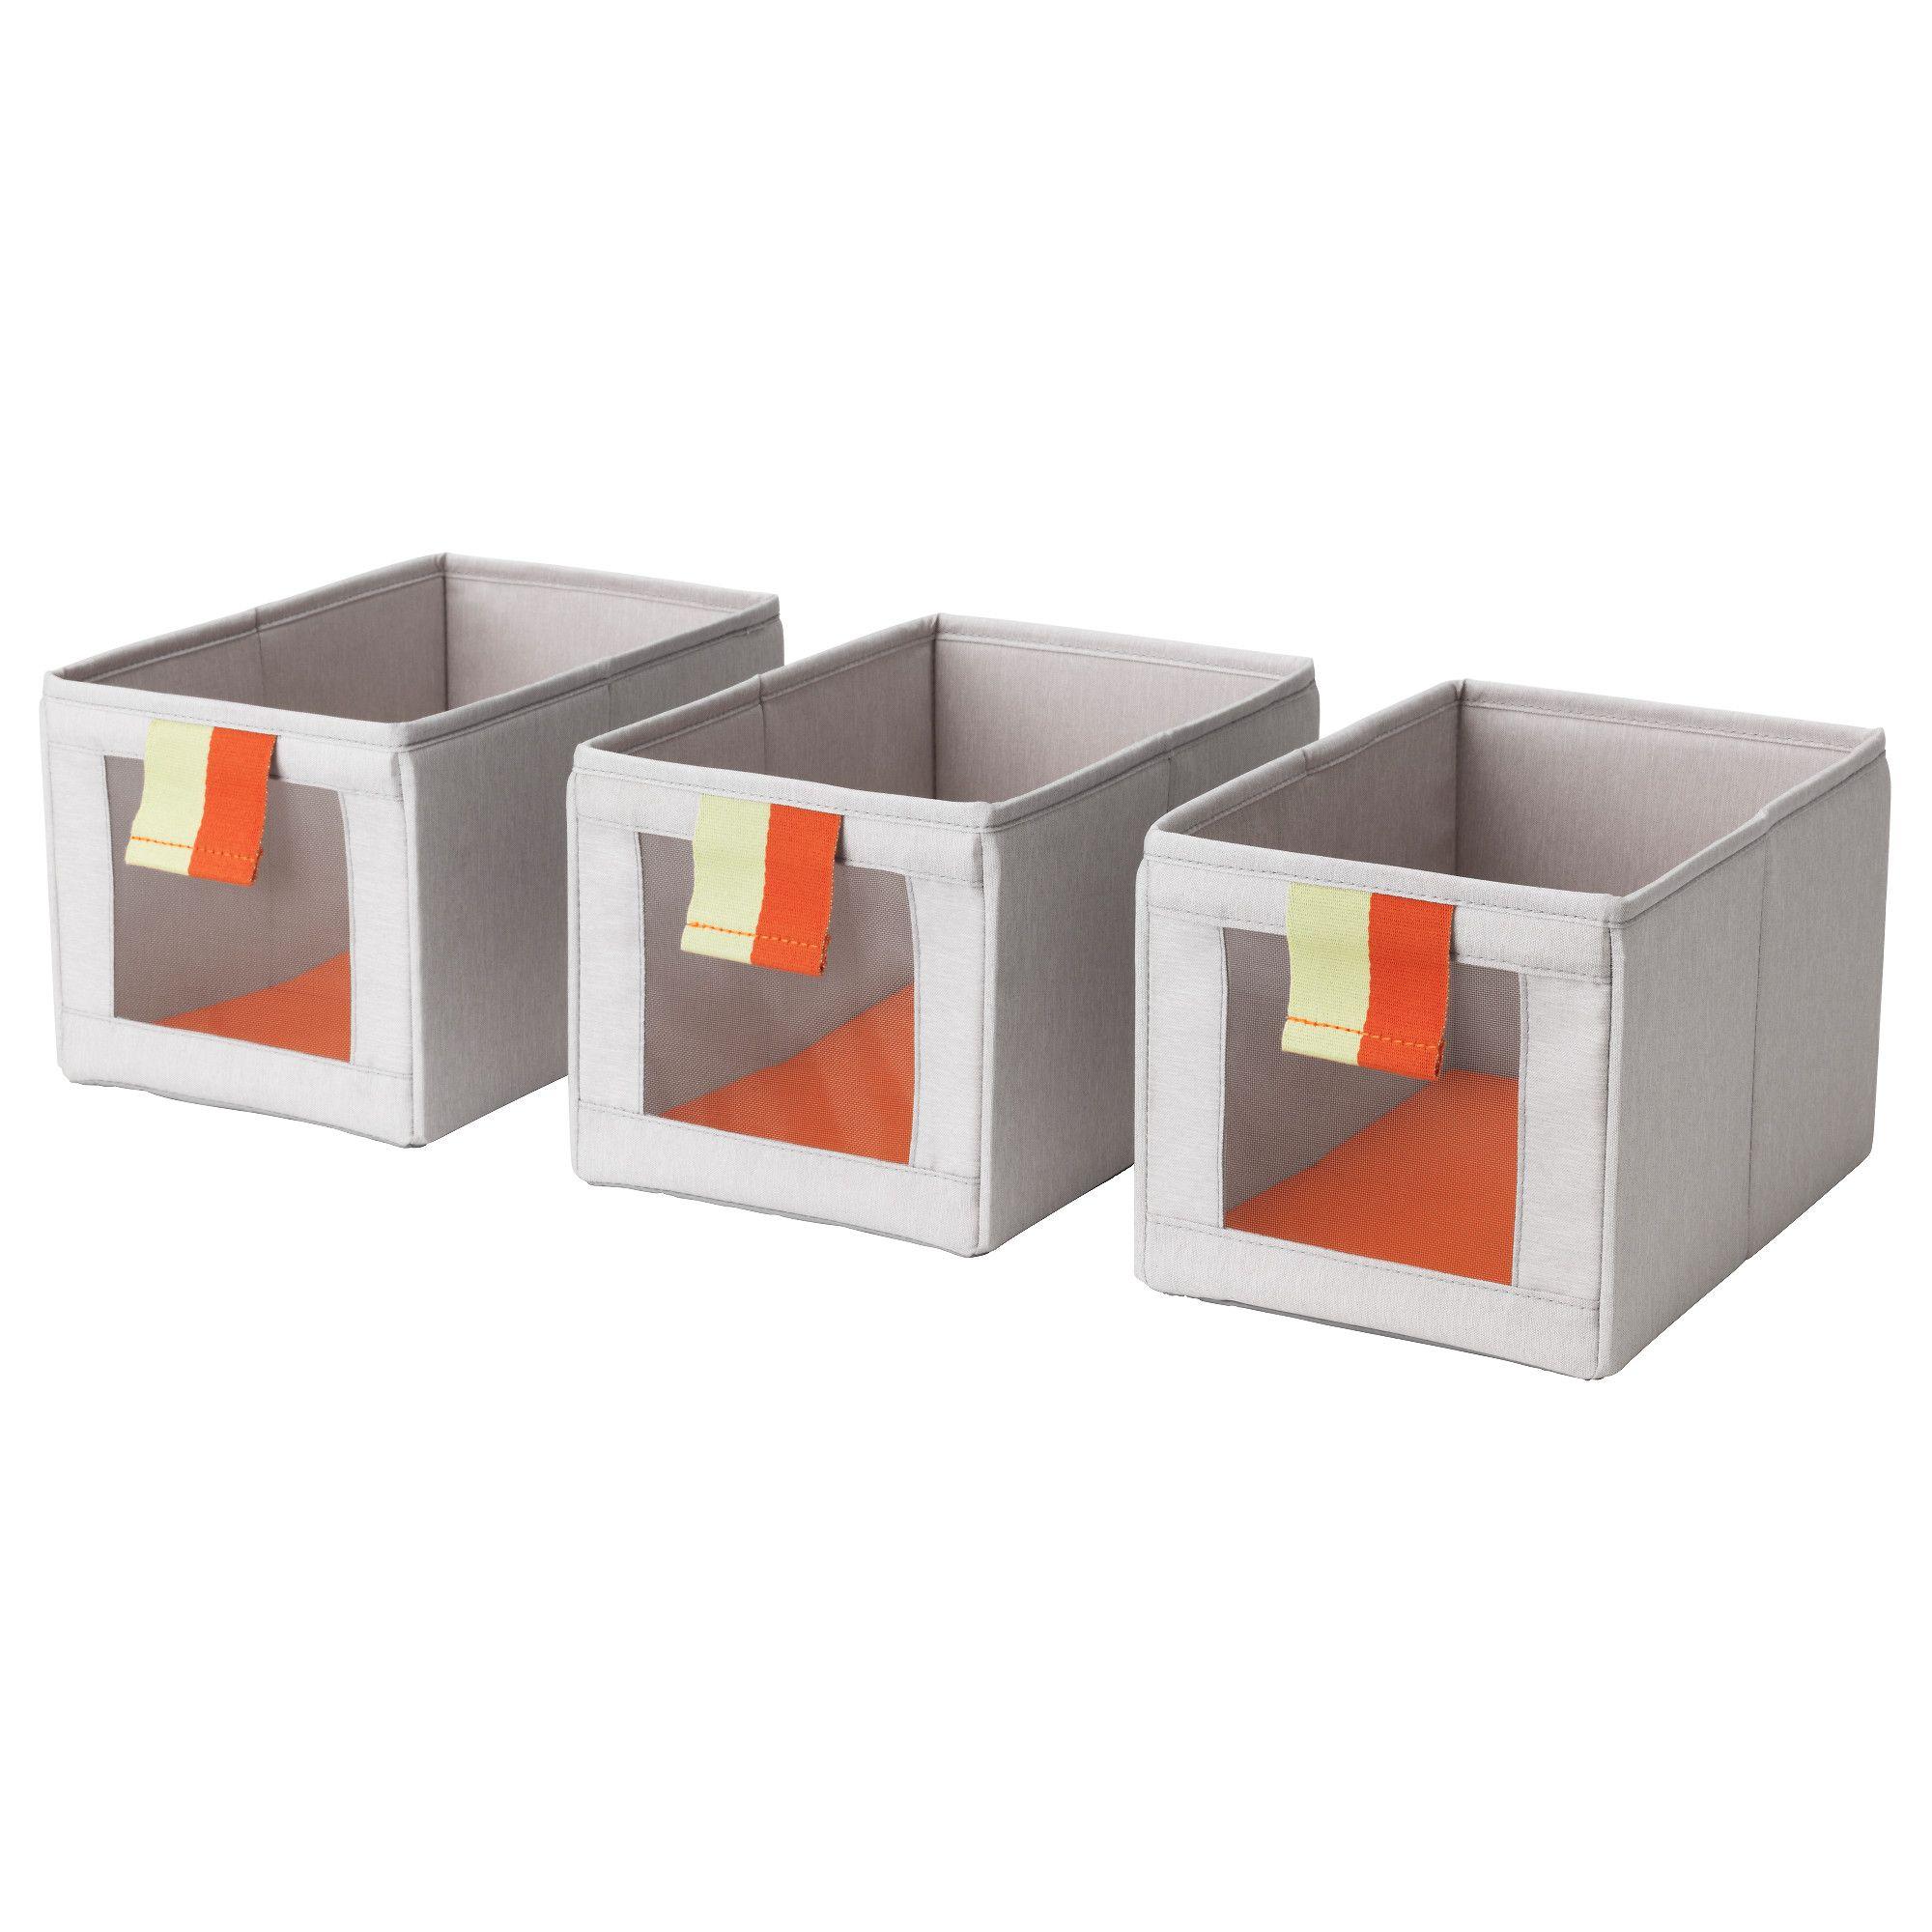 ikea sl kting box is great for montessori baby closet montessori rh pinterest ch